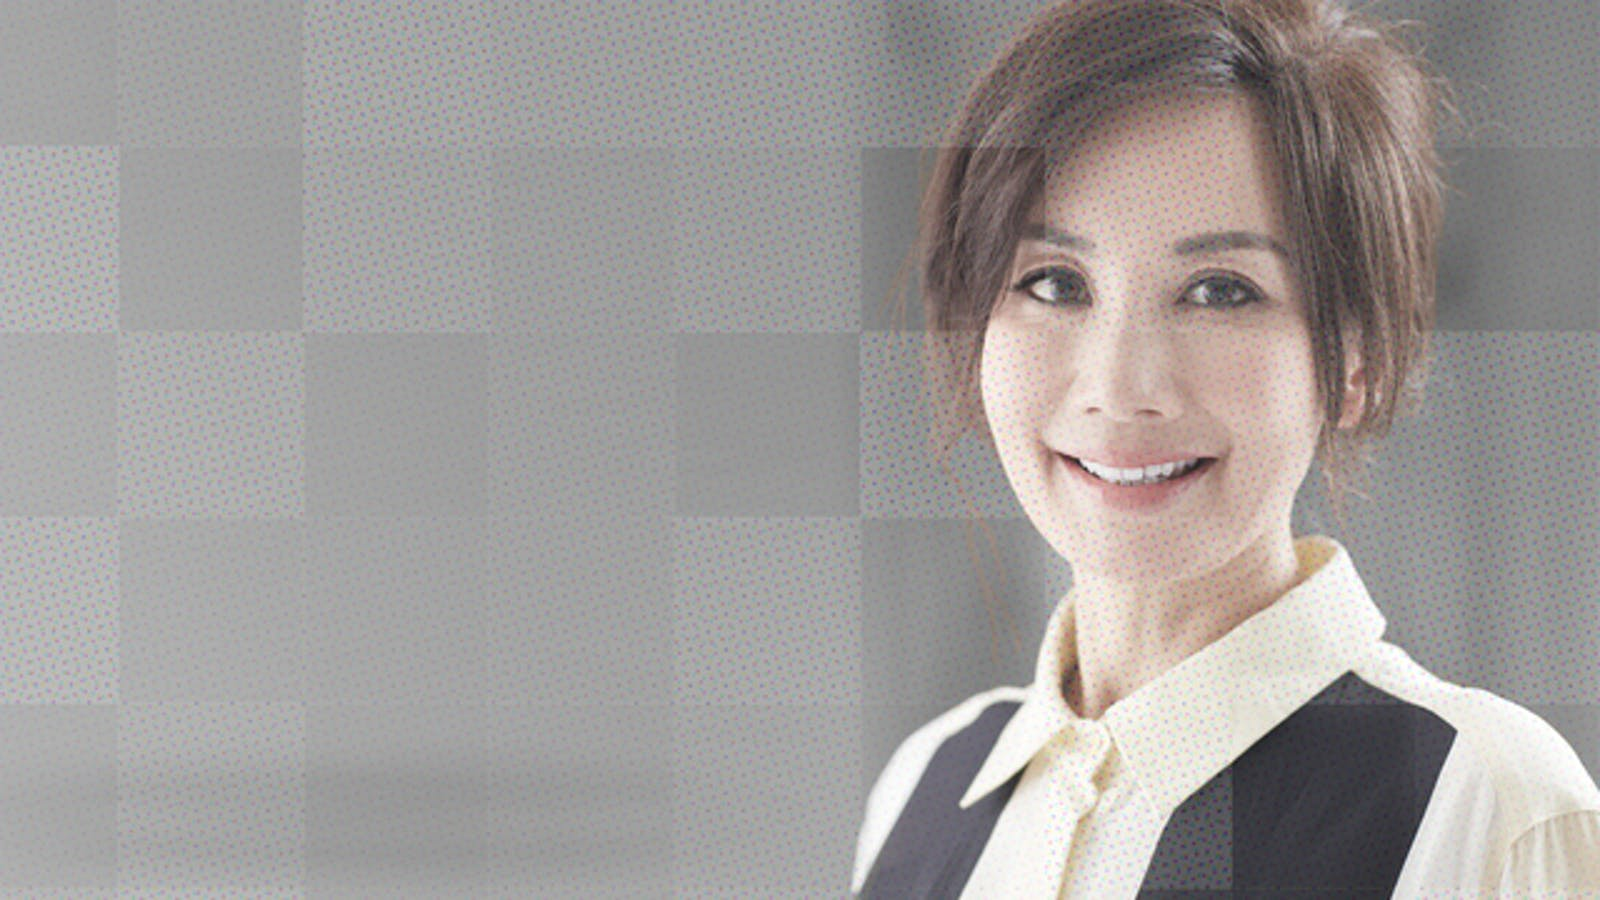 Ctrip CEO Jane Jie Sun